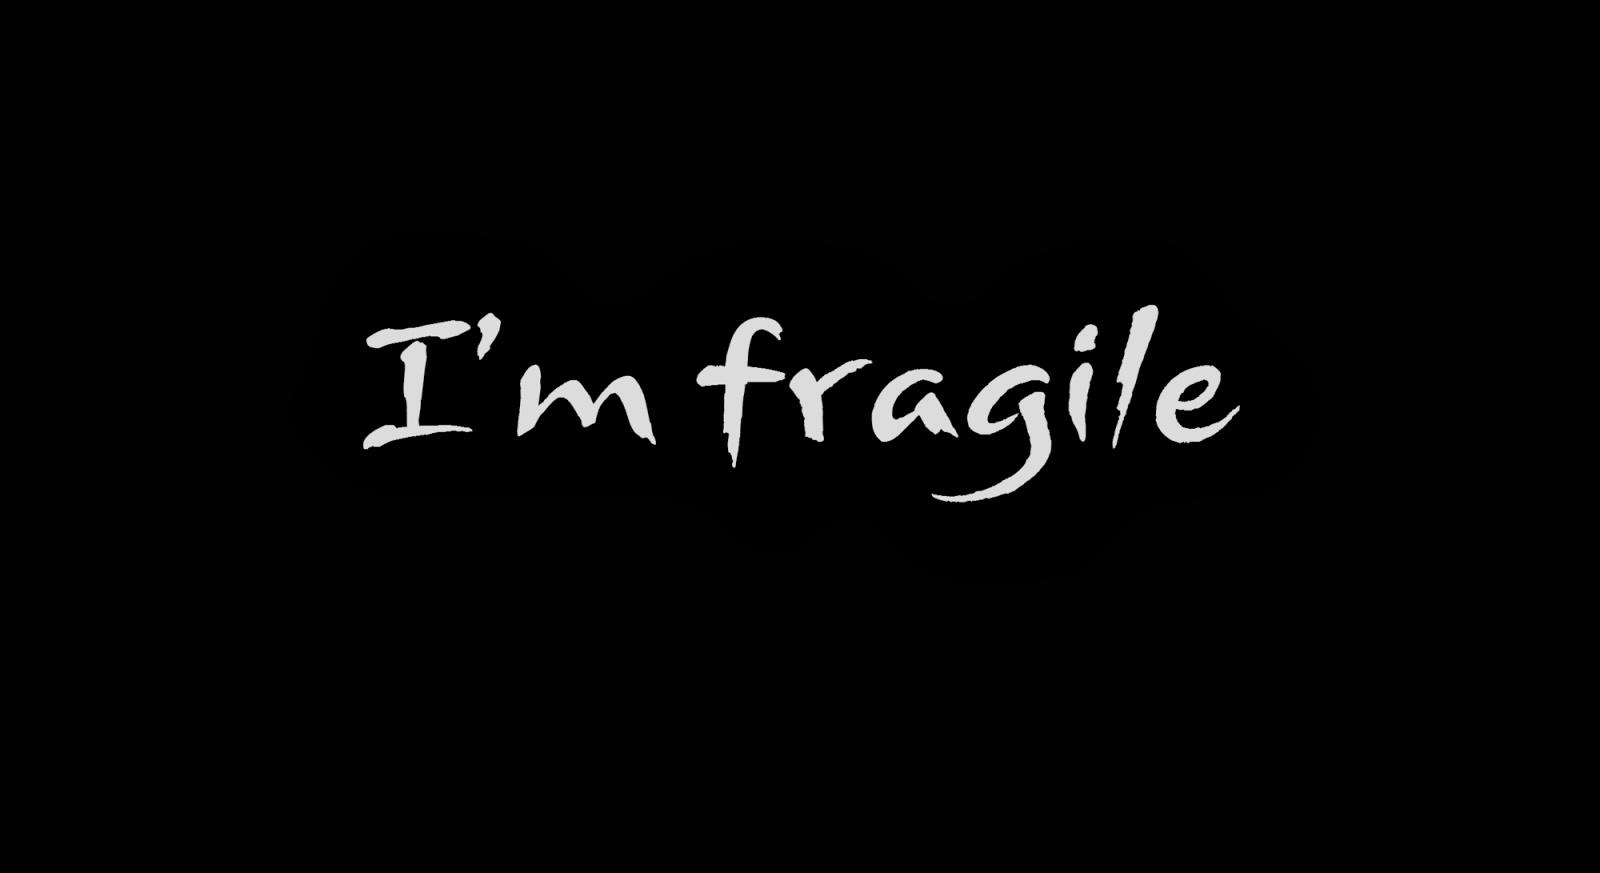 I'm fragile